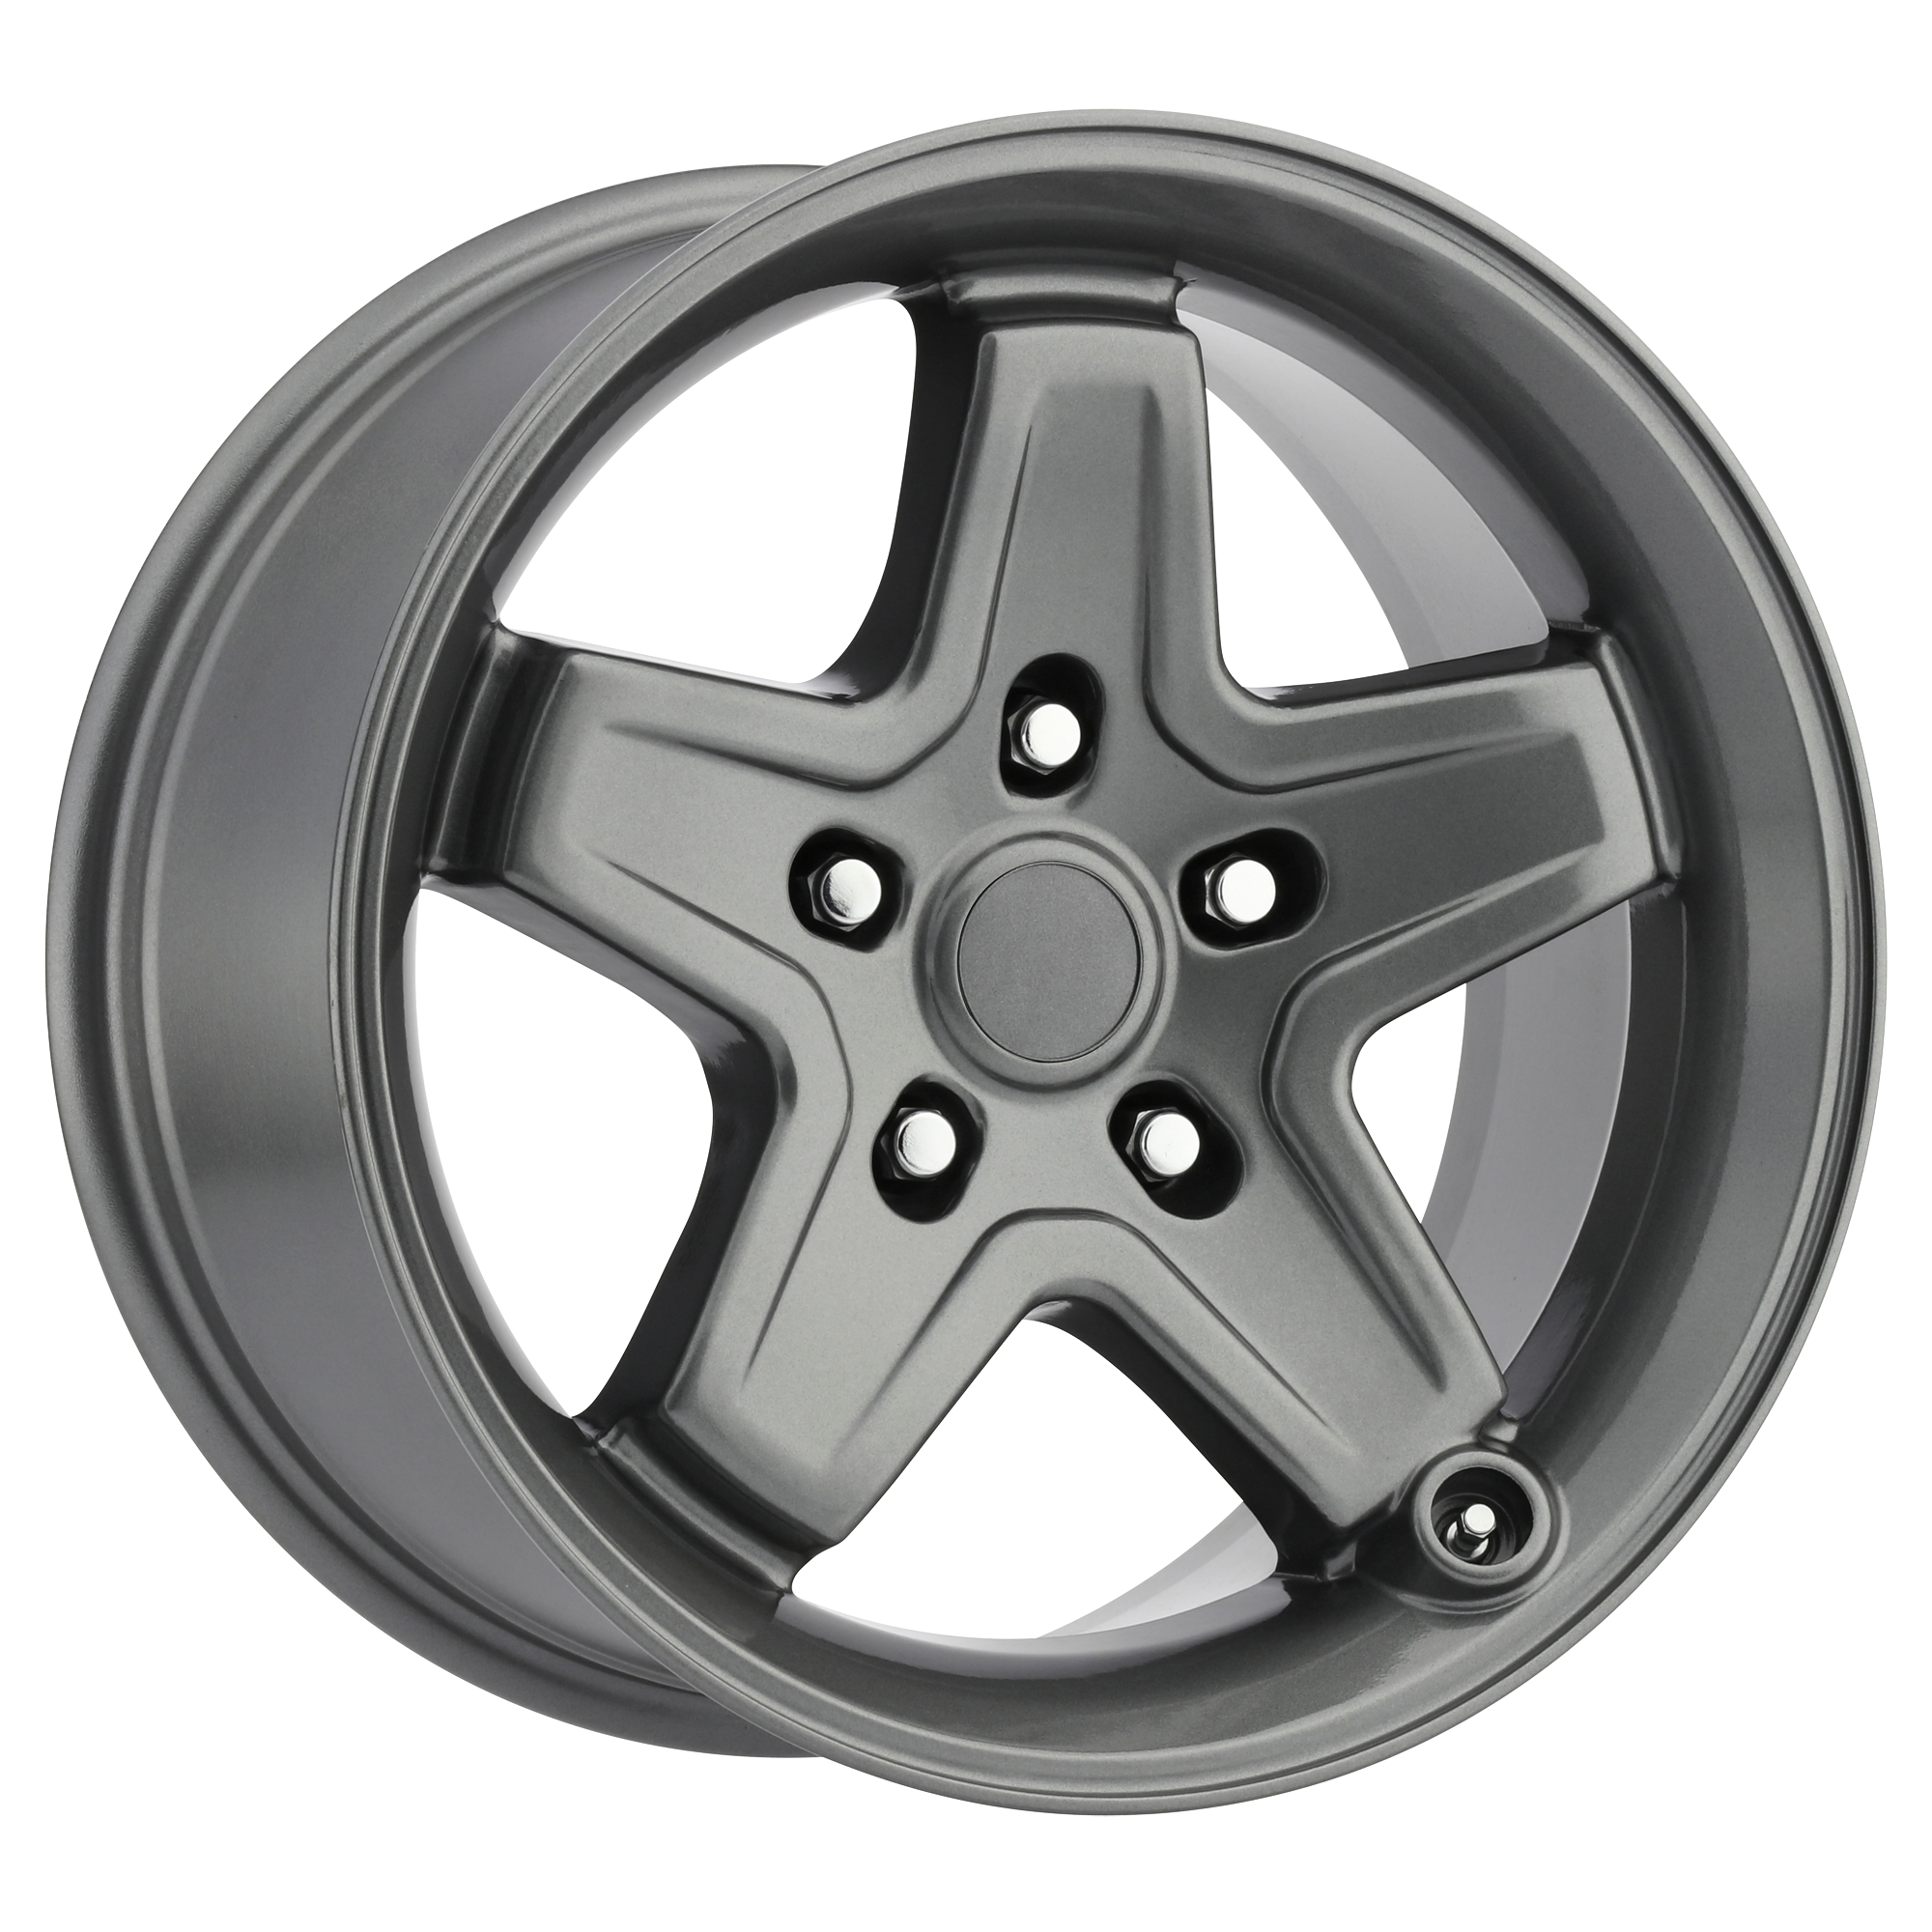 OE Creations Replica Wheels OE Creations PR180 ARGENT